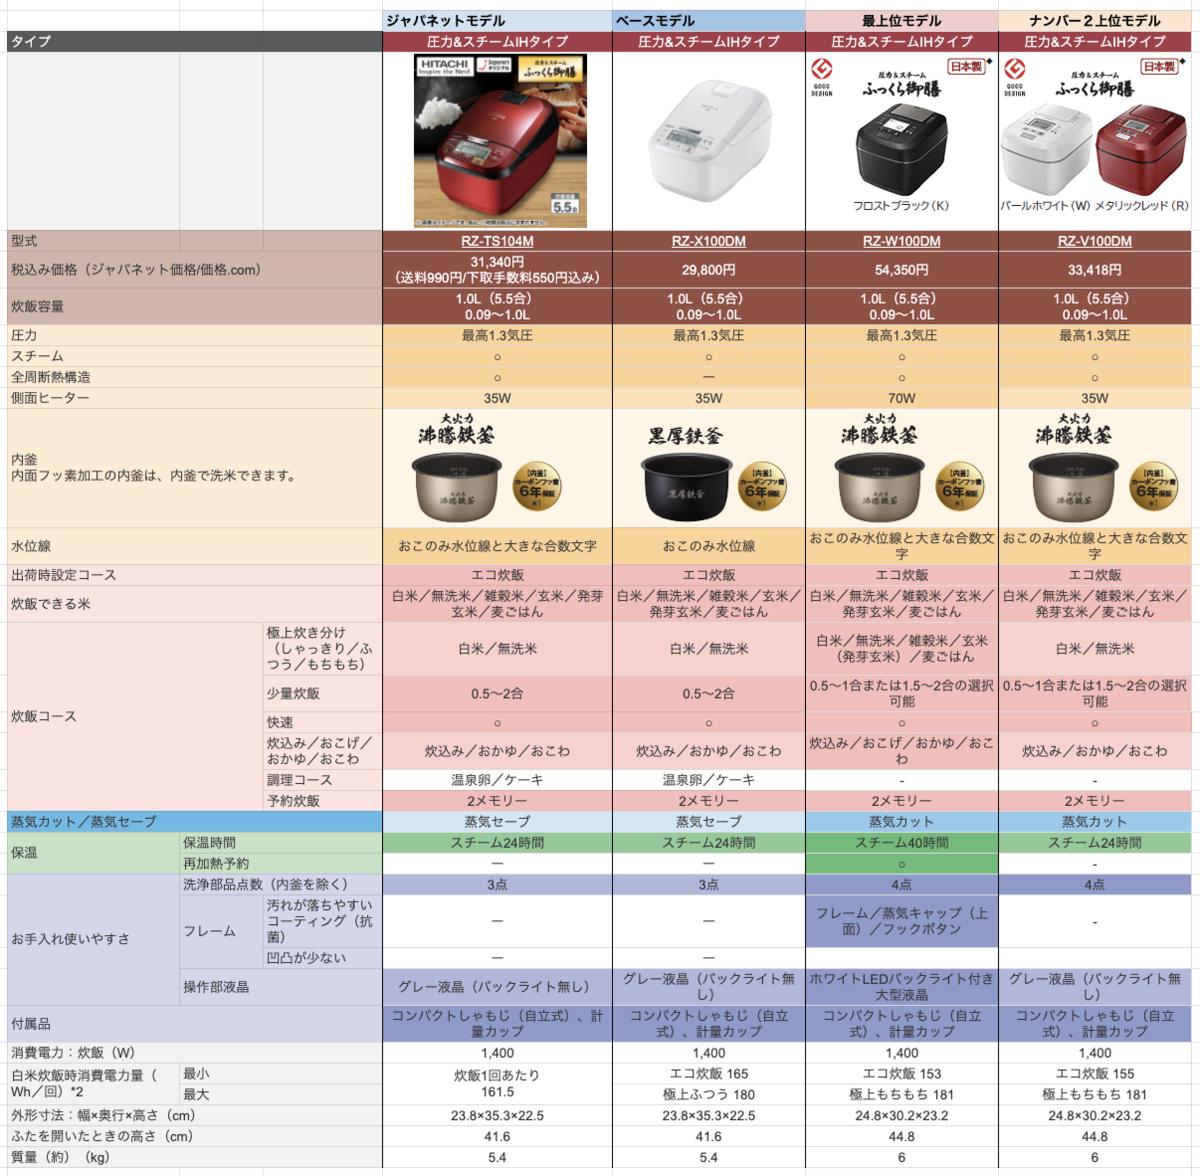 f:id:hardshopper:20201110053358p:plain